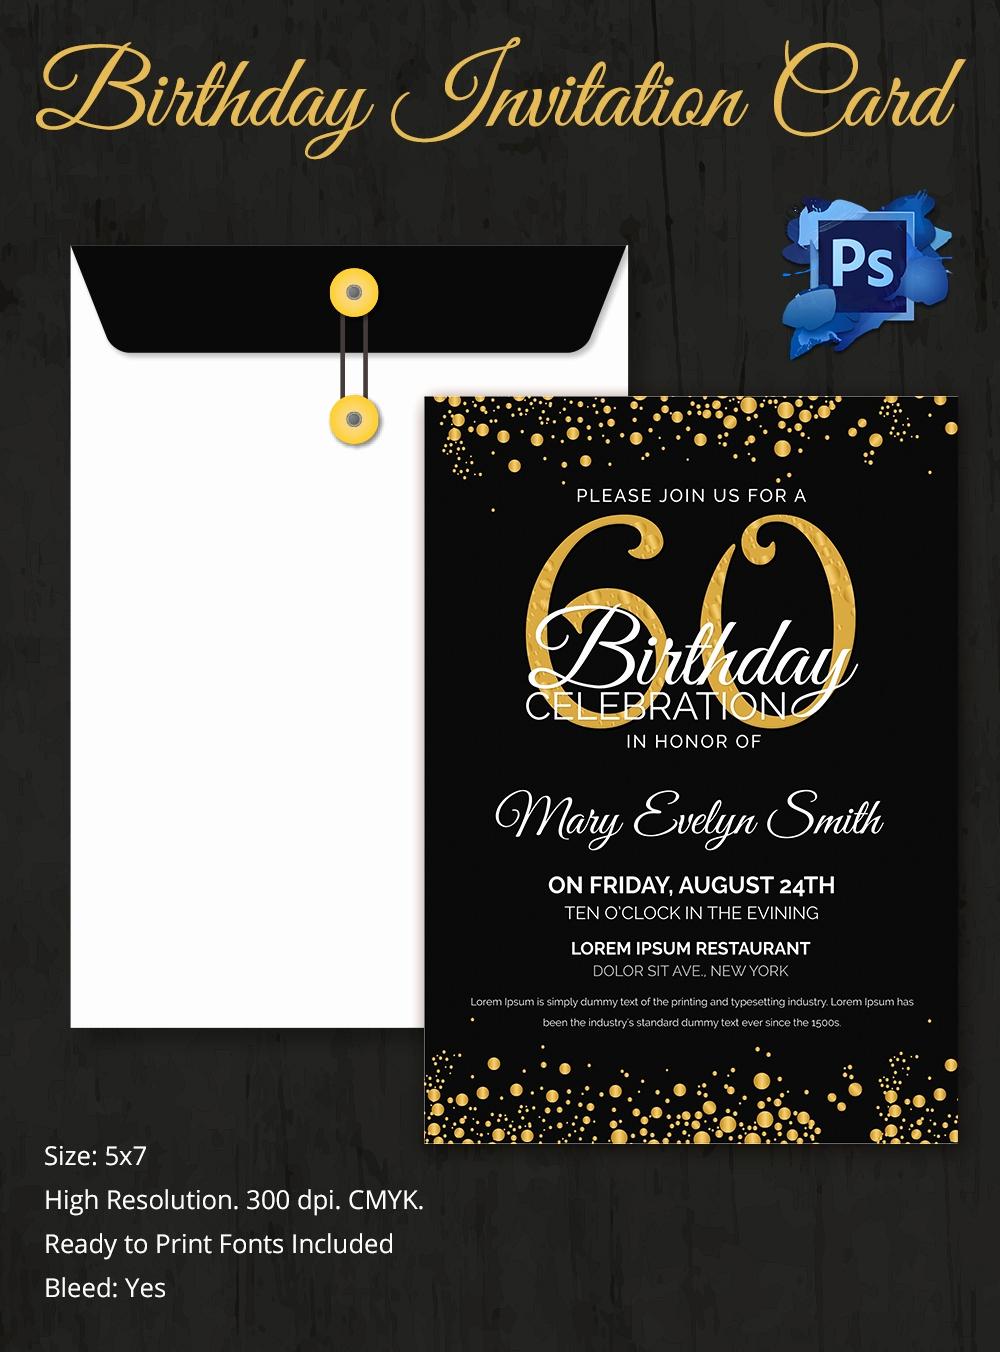 Free Templates for Invitations Inspirational Birthday Invitation Template 32 Free Word Pdf Psd Ai